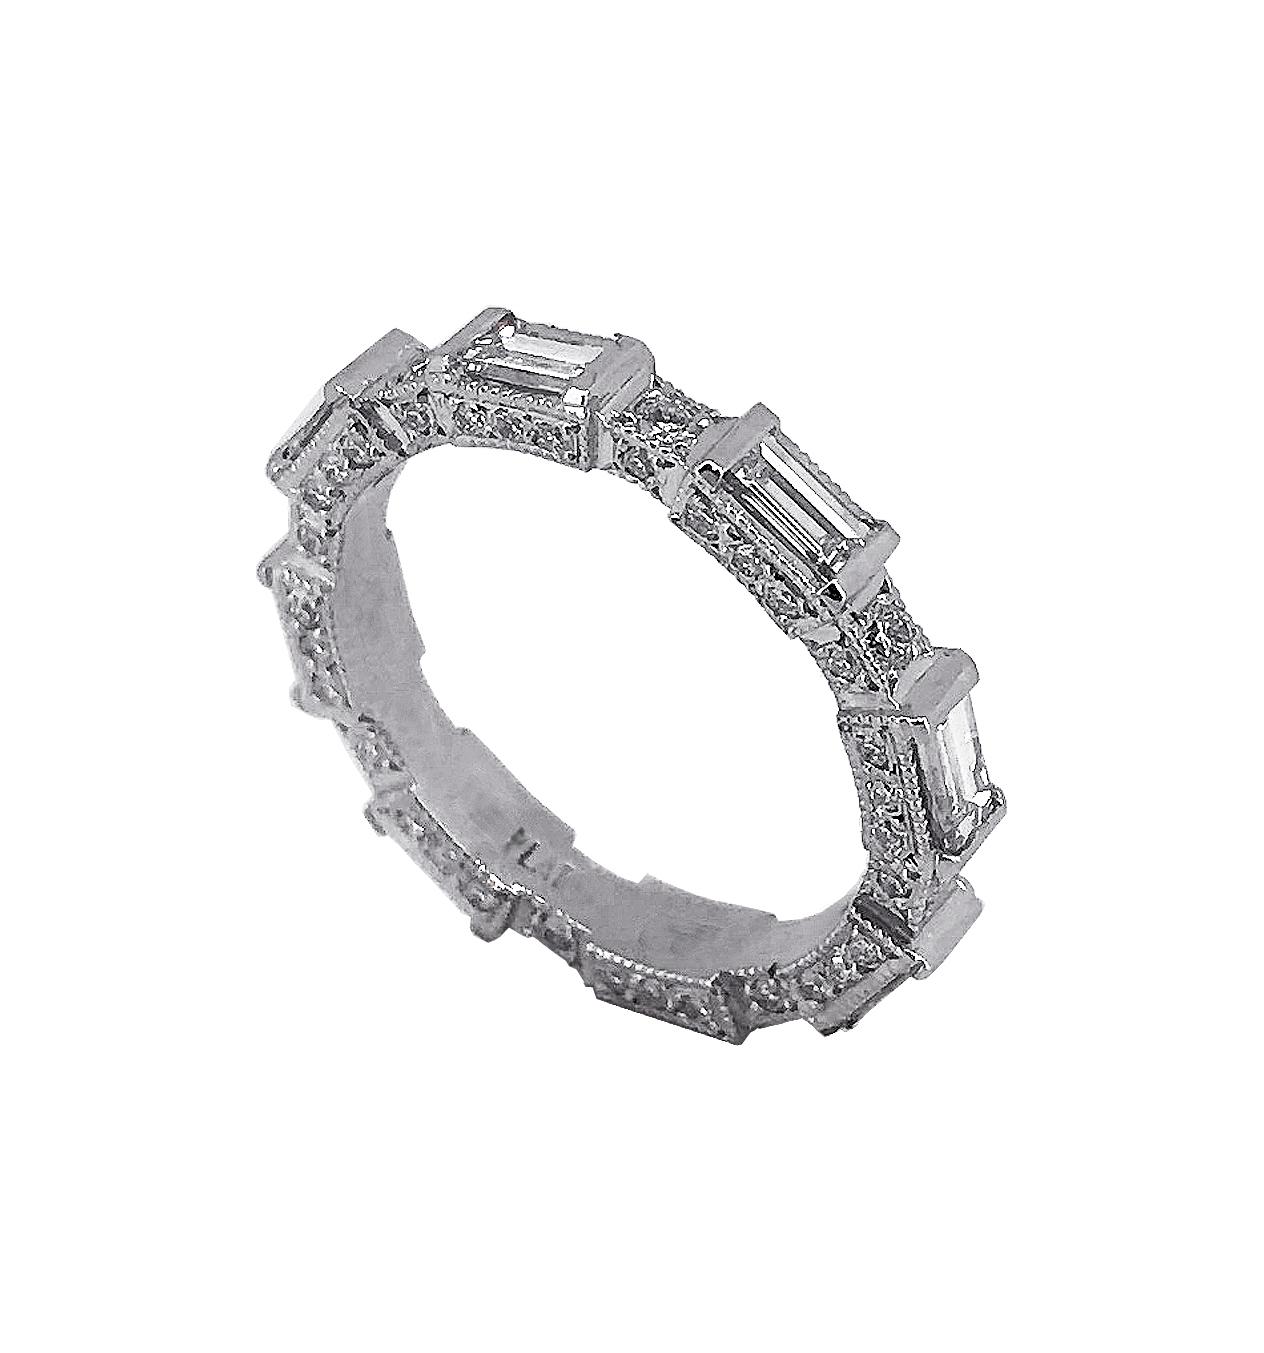 Bespoke Diamond Baguette Wedding Ring in Platinum